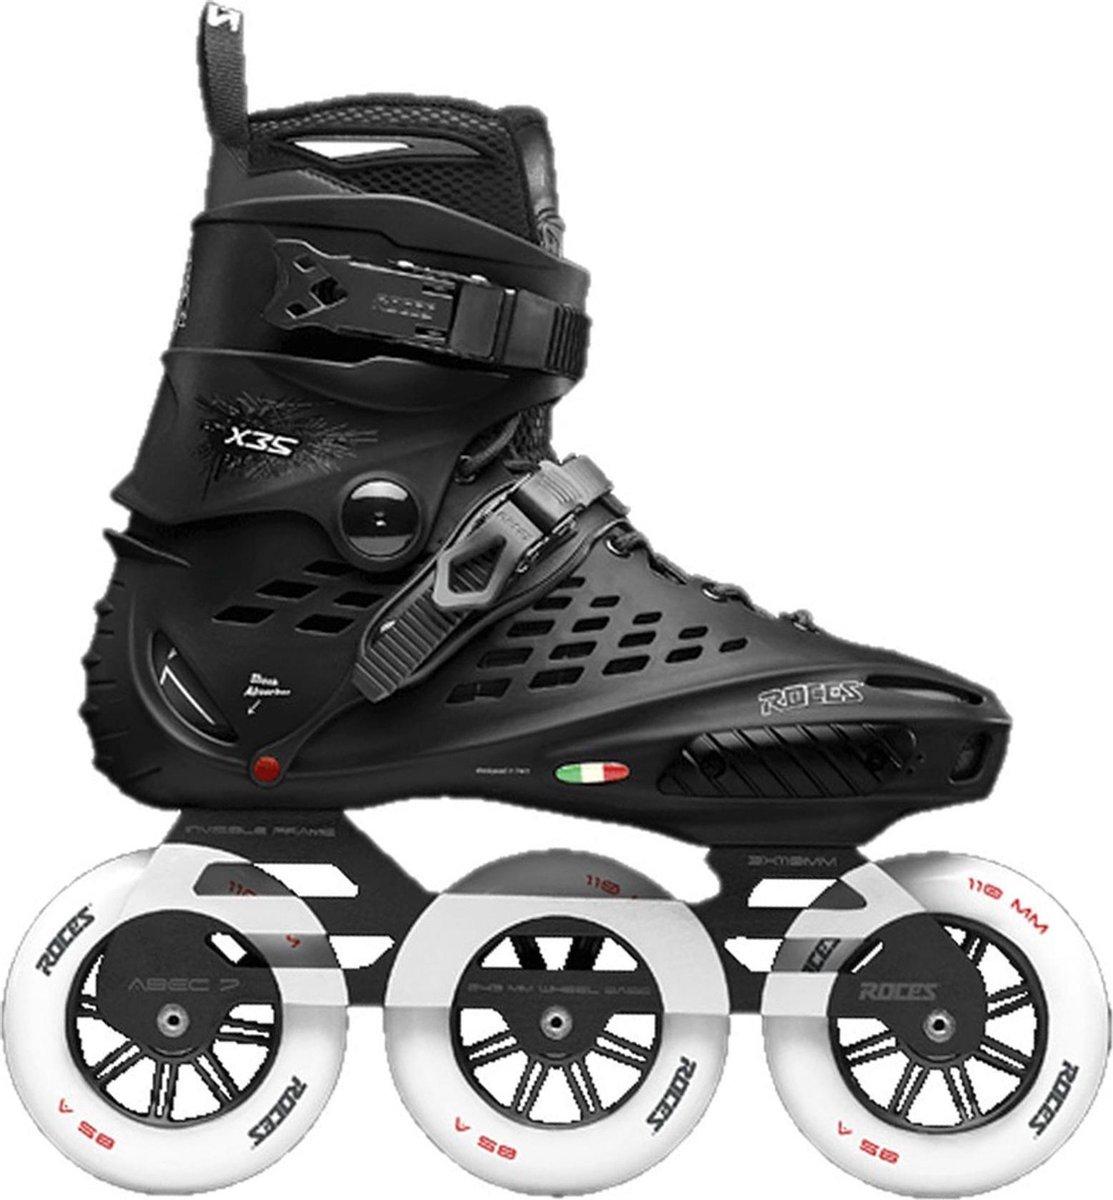 Roces X35 3x110 TIF Inline Skate Inlineskates - Maat 41 - Unisex - zwart/wit